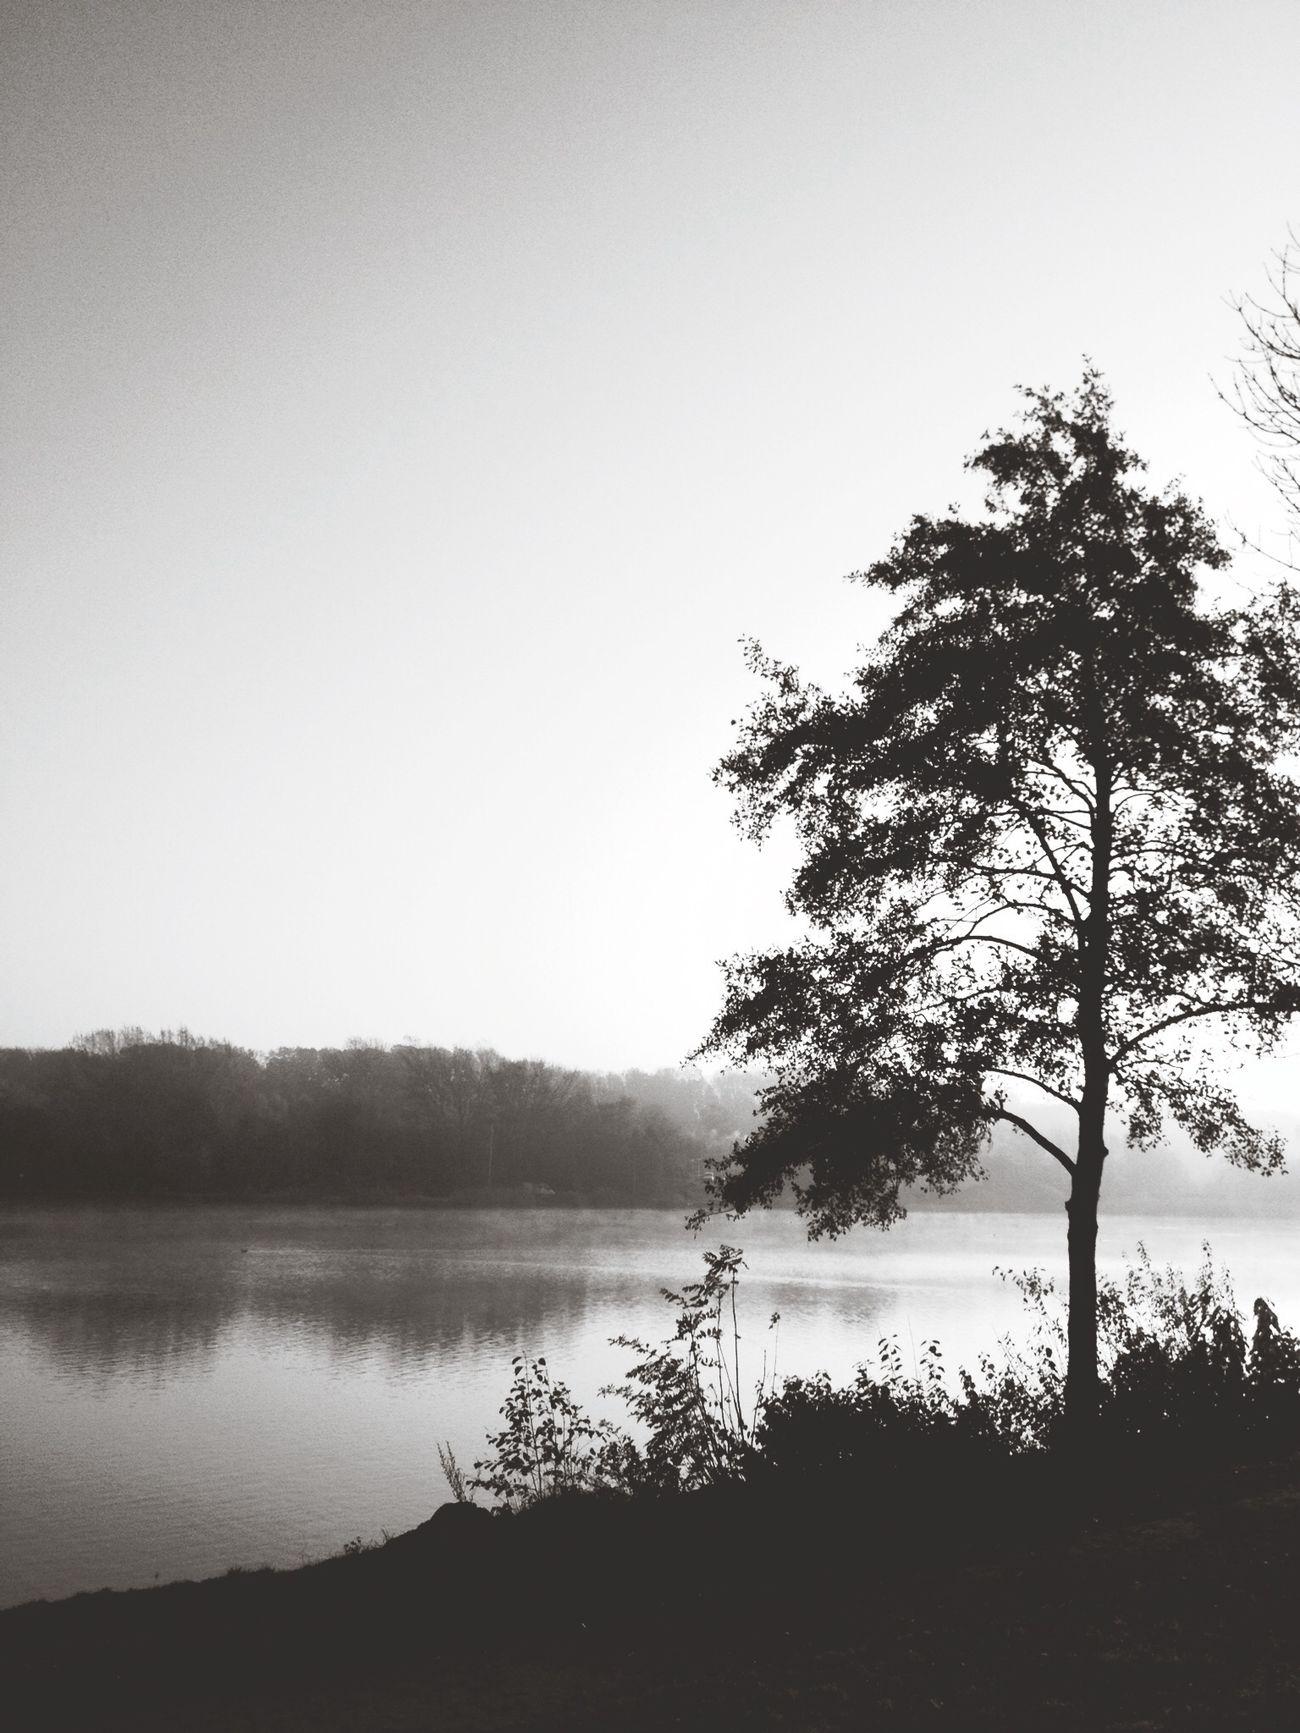 EyeEmBestEdits AMPt_community Blackandwhite Landscape_Collection